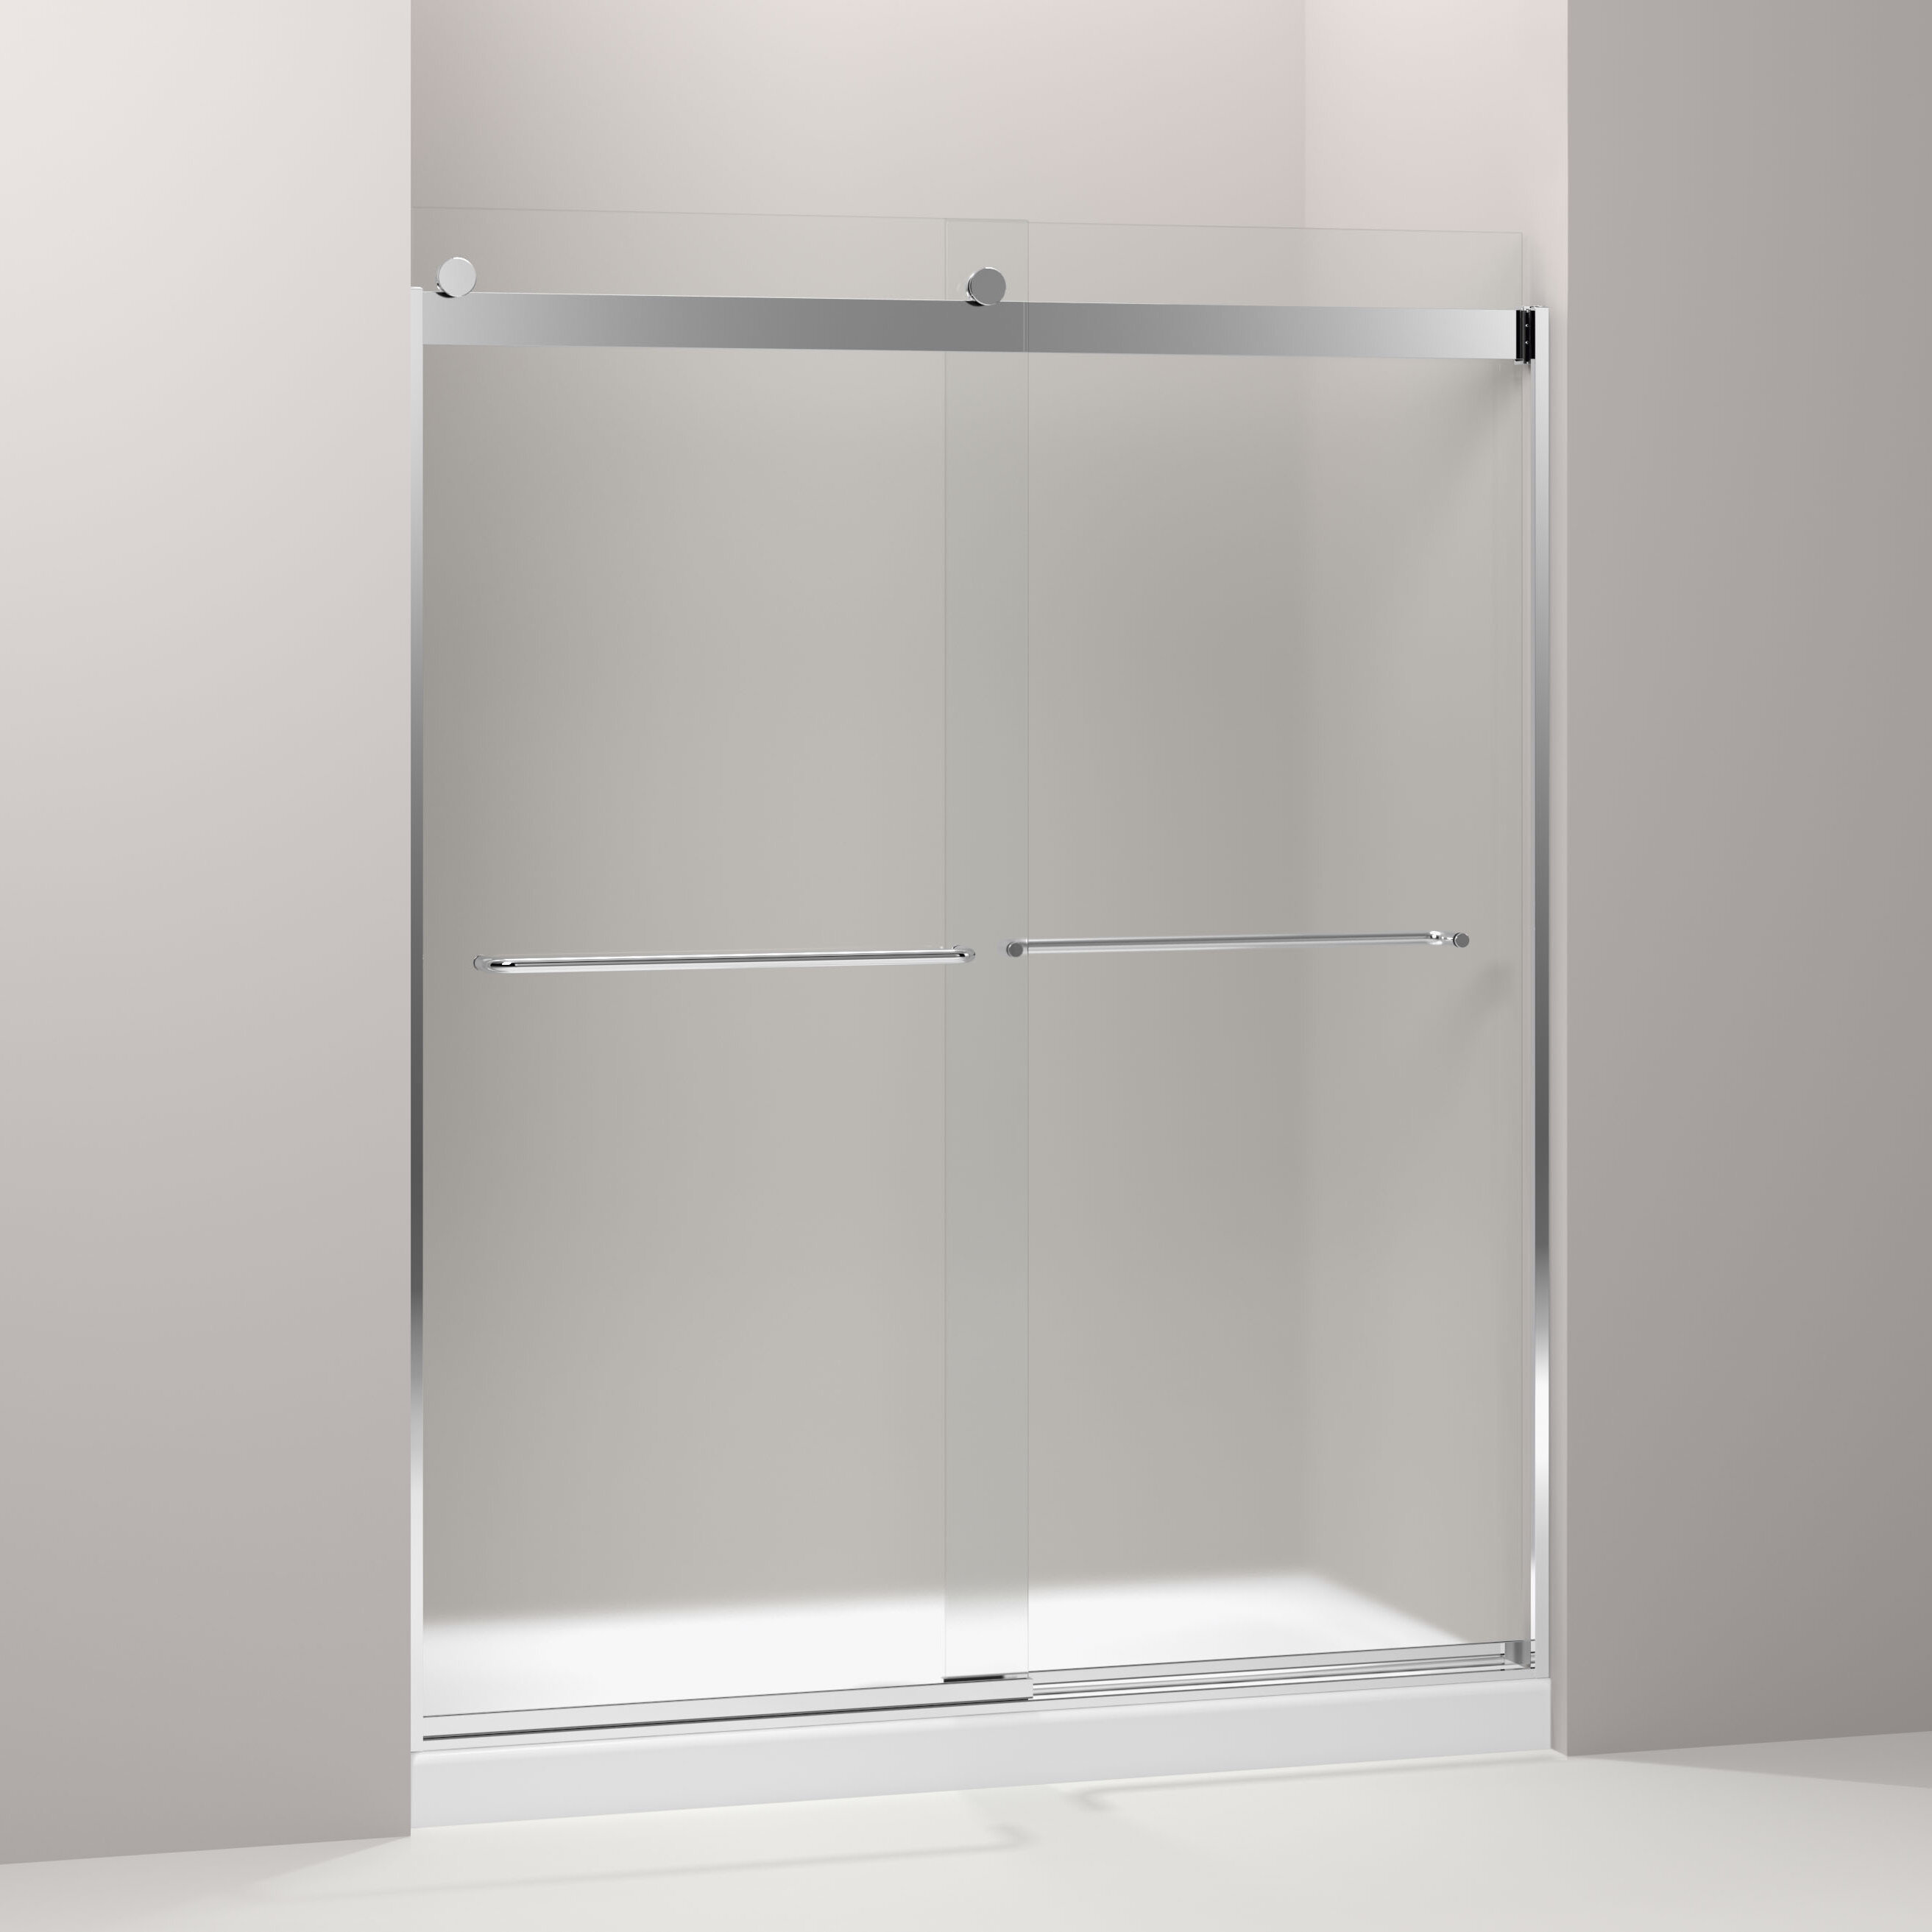 K 706015 D3 Abvmxsh Kohler Levity 5963 X 74 Bypass Shower Door